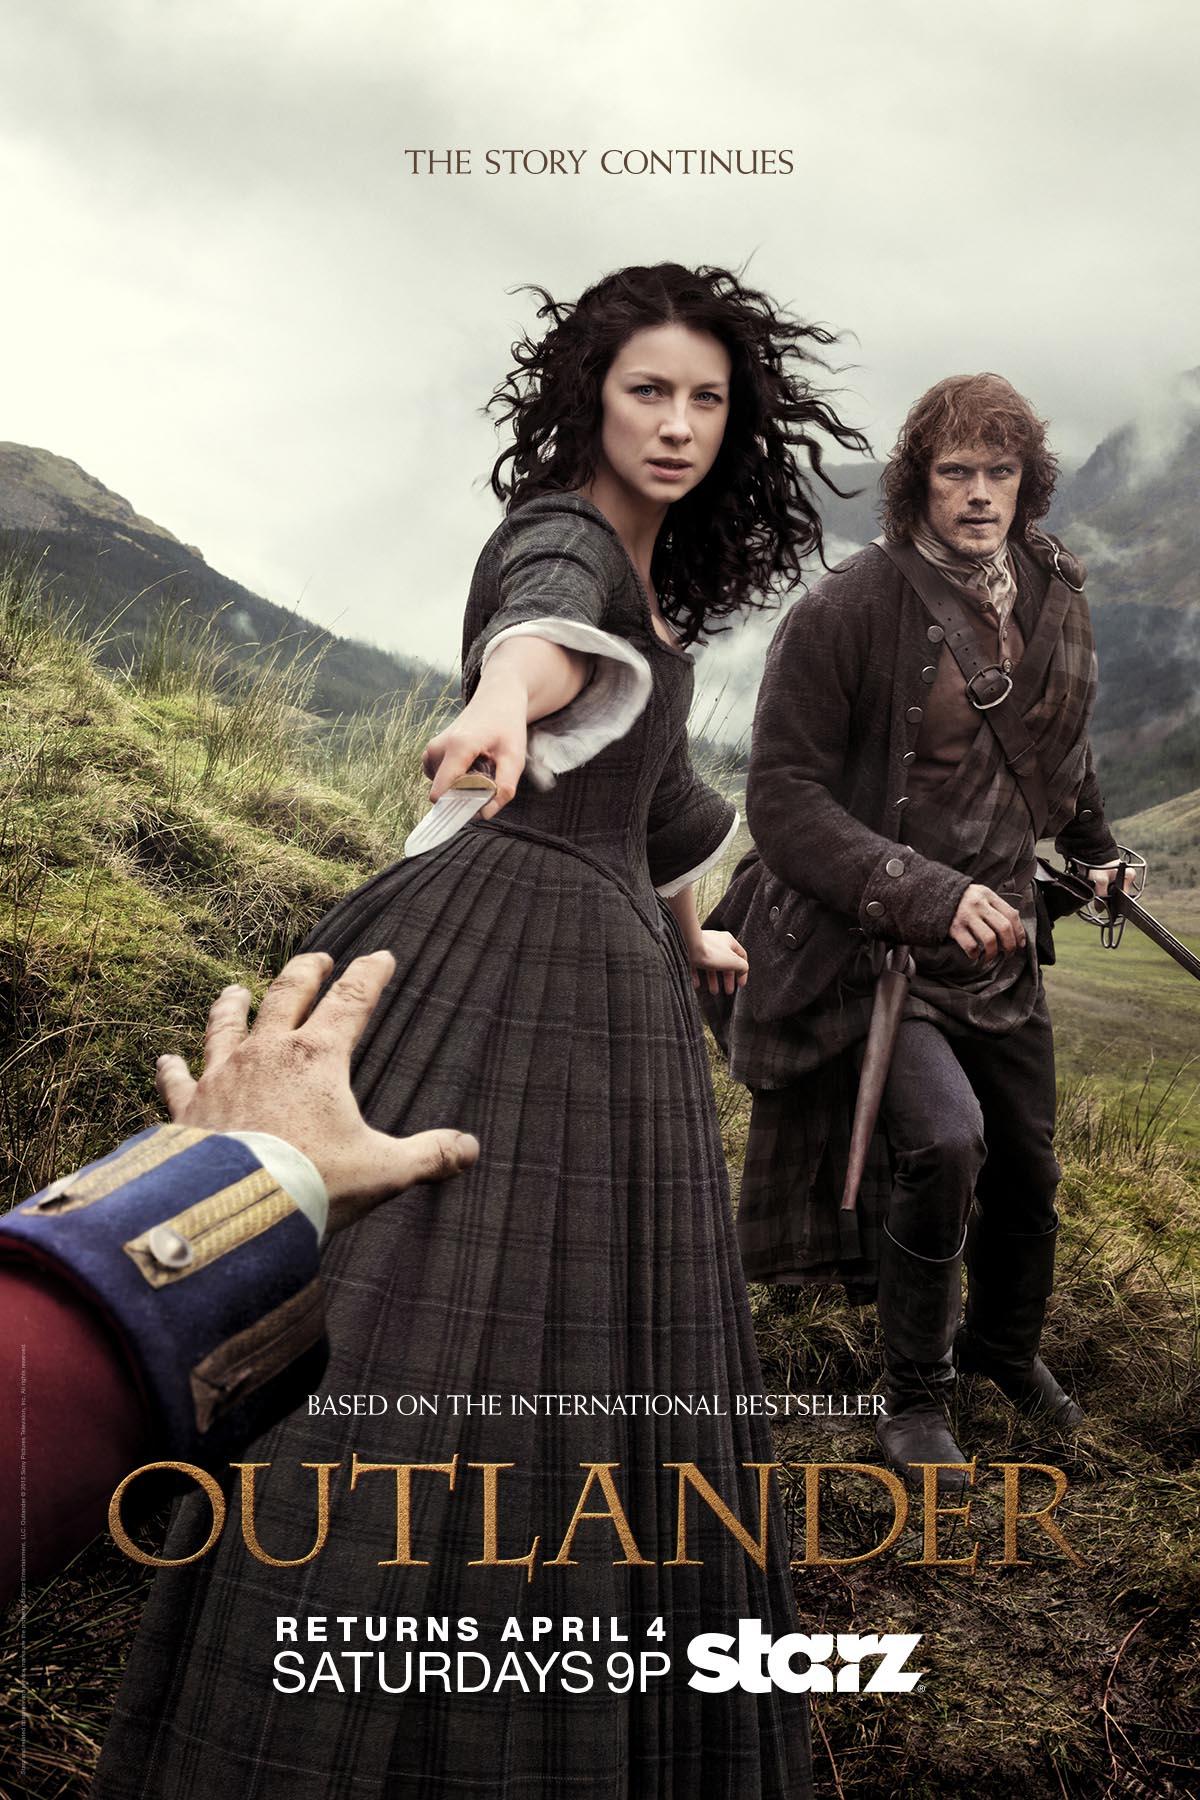 International cinema clips website 01 11 - Outlander Season 1 Part 2 Tv Show Poster